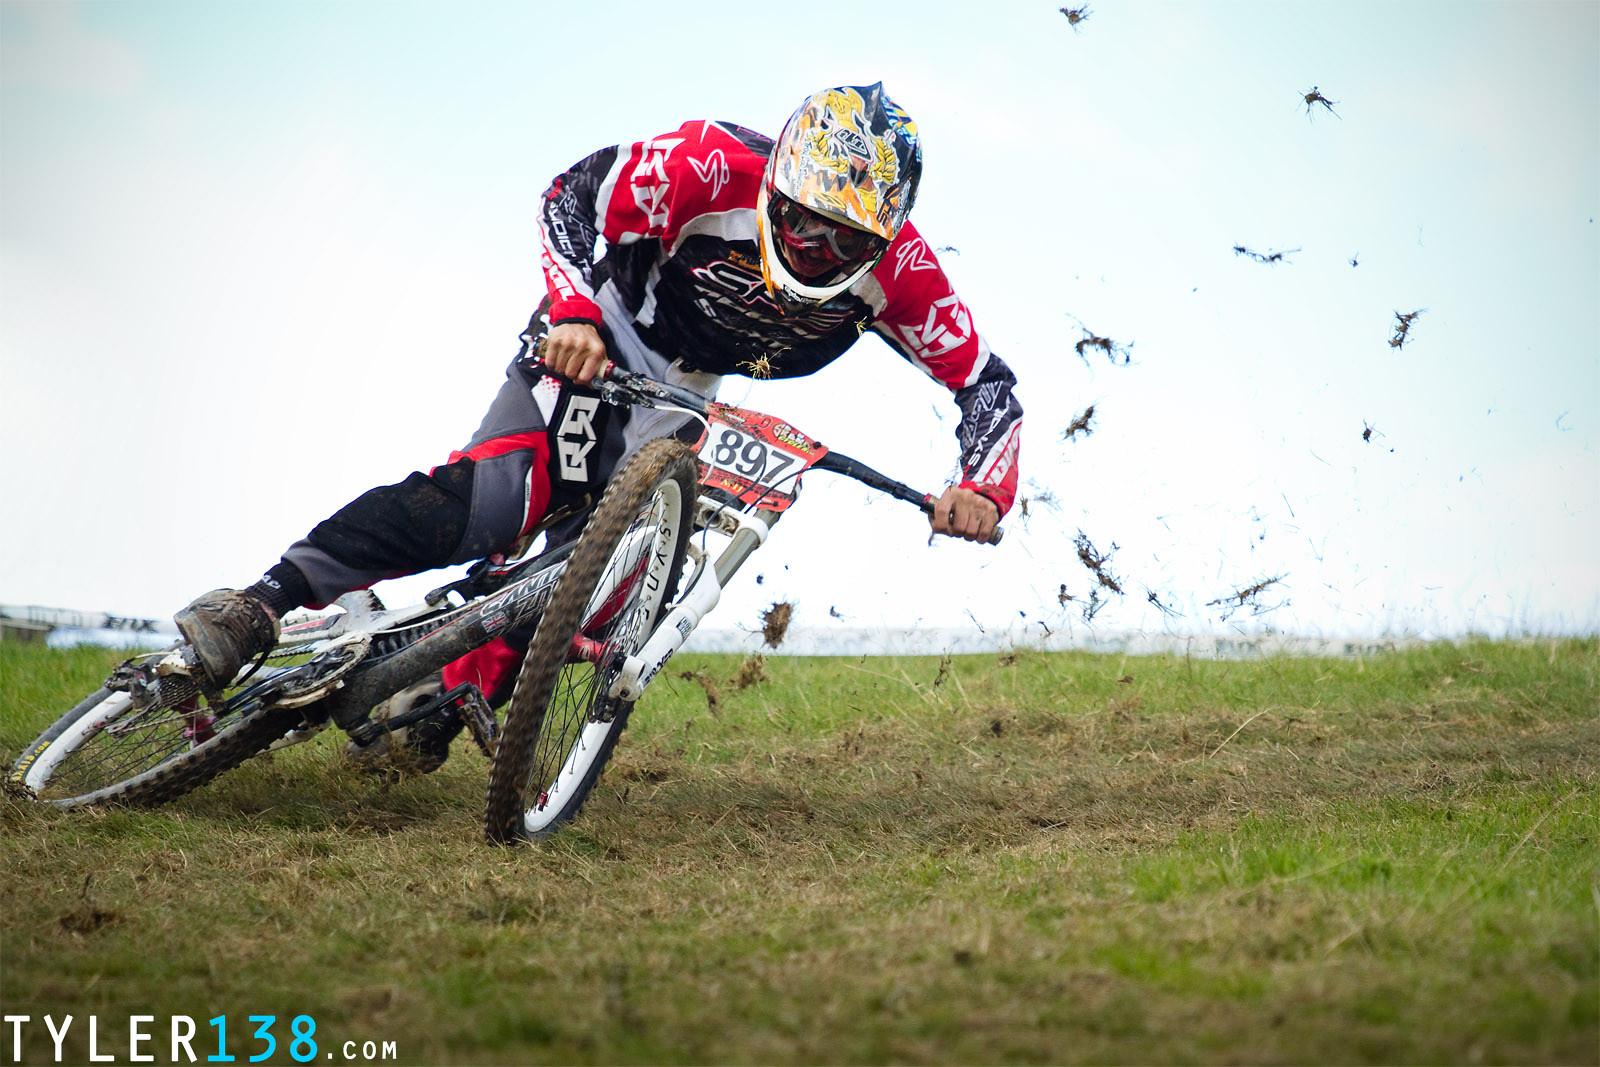 2011 Welsh Champ Billy Matthews  - Tyler138 - Mountain Biking Pictures - Vital MTB